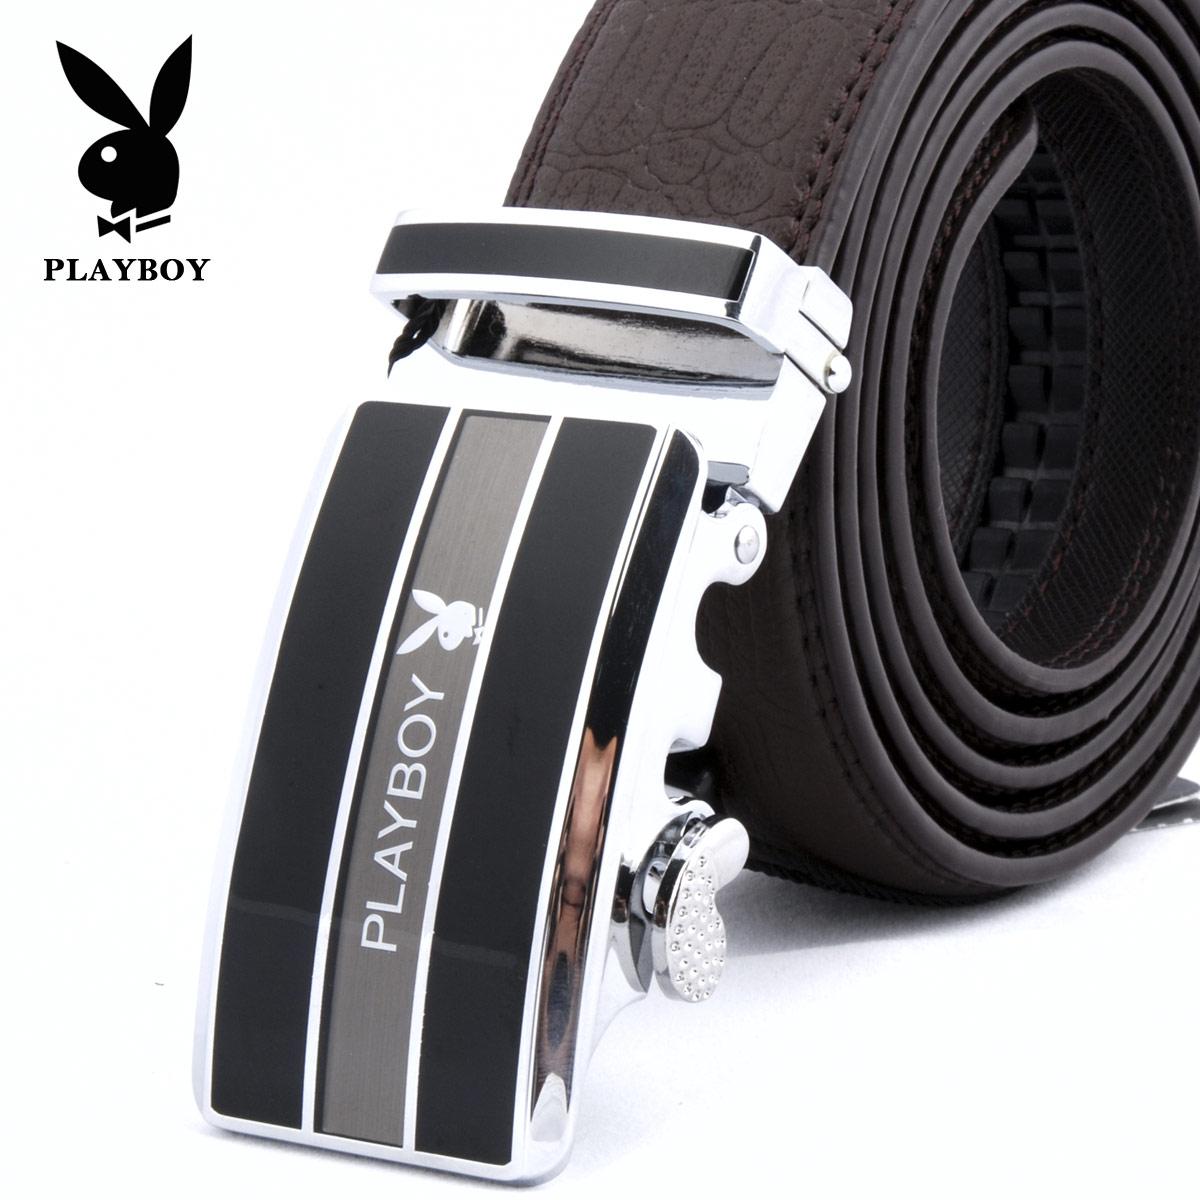 Ремень Playboy pdf0748/12cf